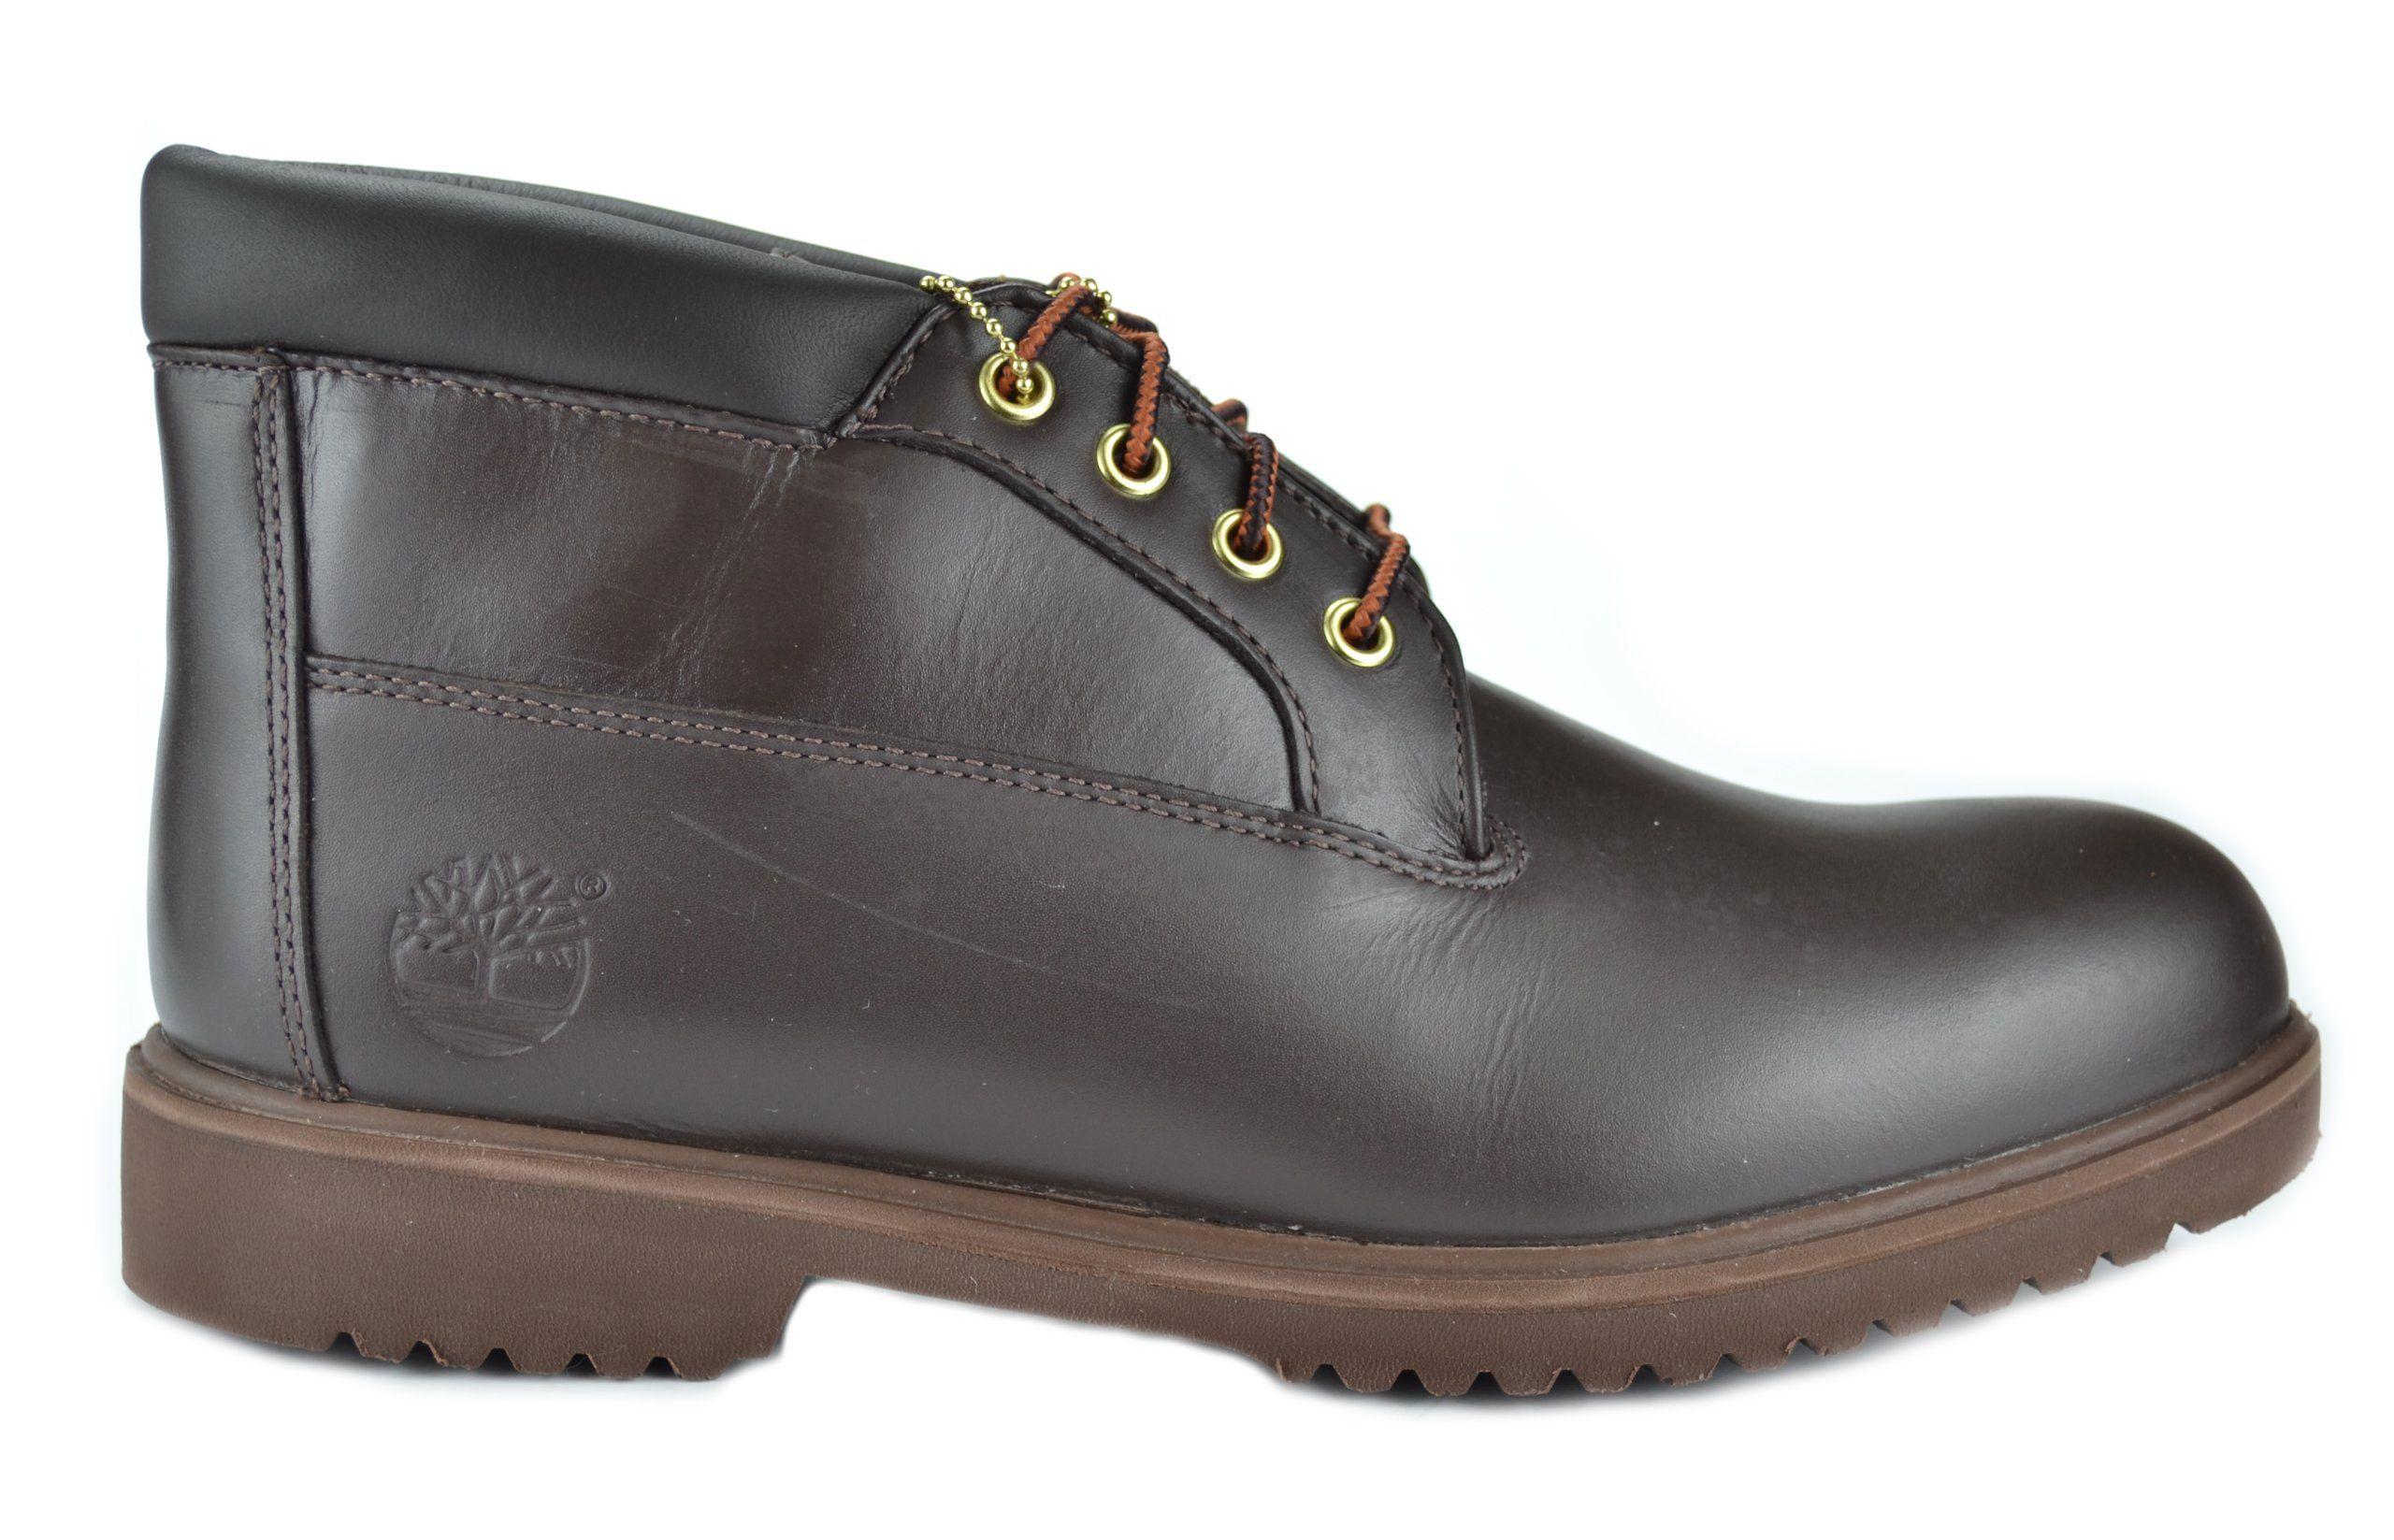 Timberland heritage chukka brown mens boots brown ueueue read